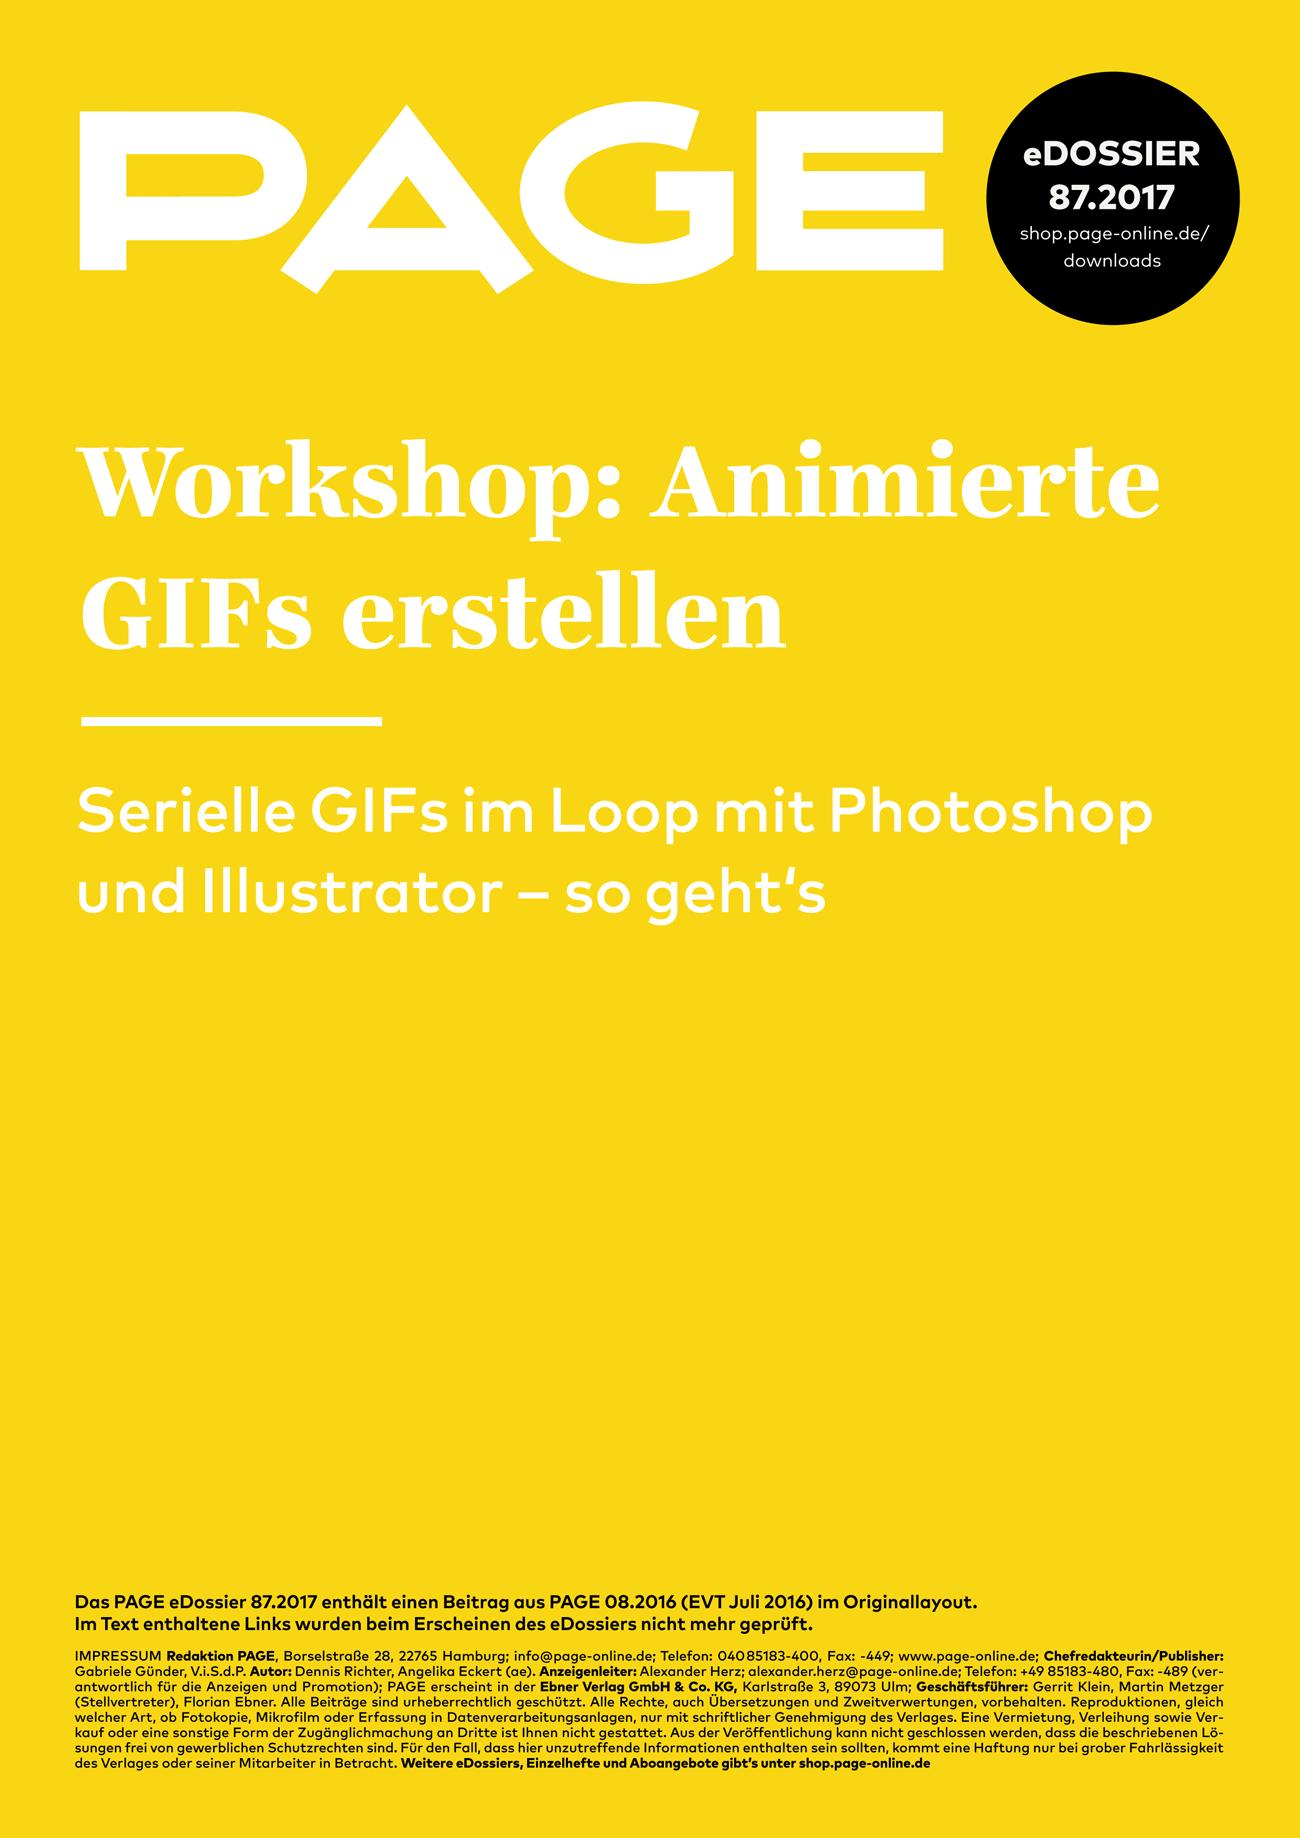 Animierte GIFs erstellen, Photoshop, Illustrator